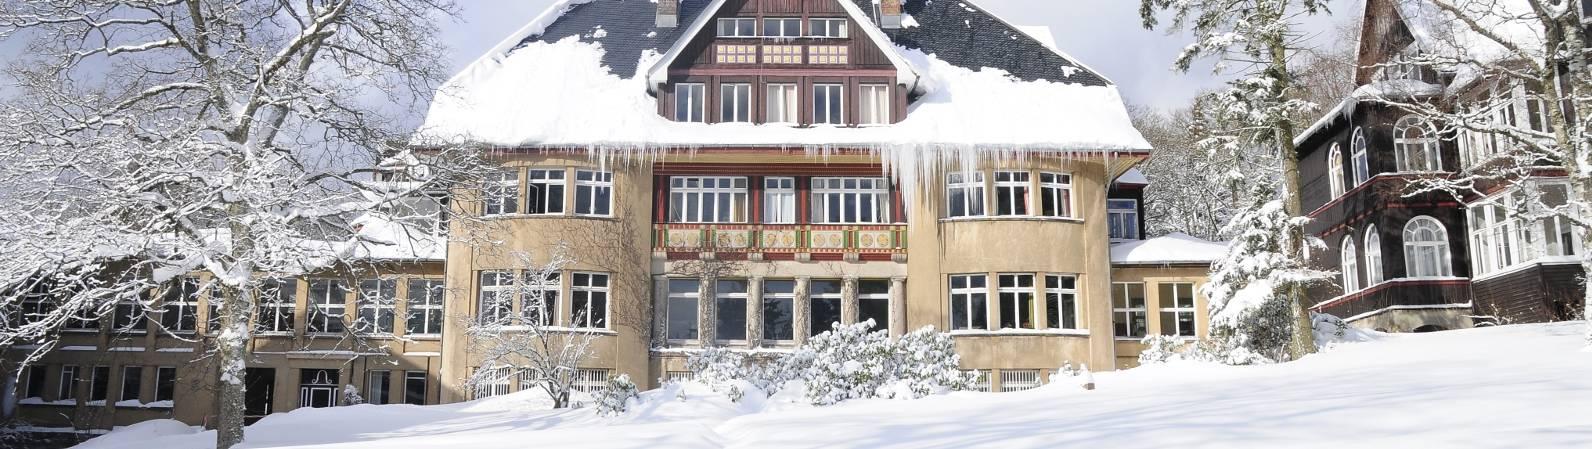 Psychosomatisches Krankenhaus Sanatorium Dr. Barner